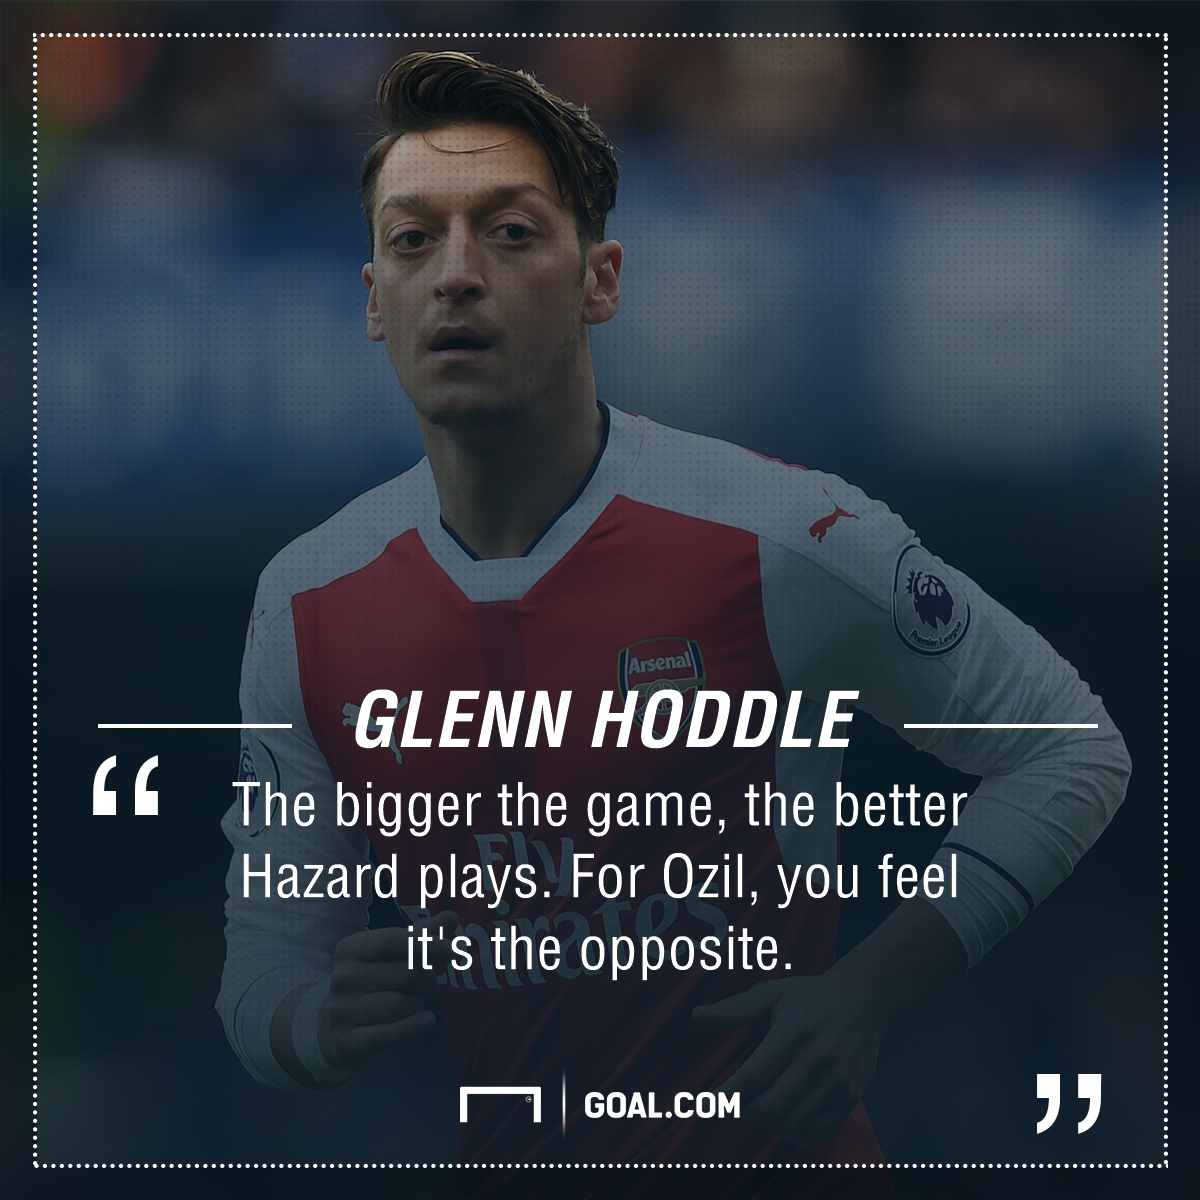 Glenn Hoddle Hazard Ozil PS